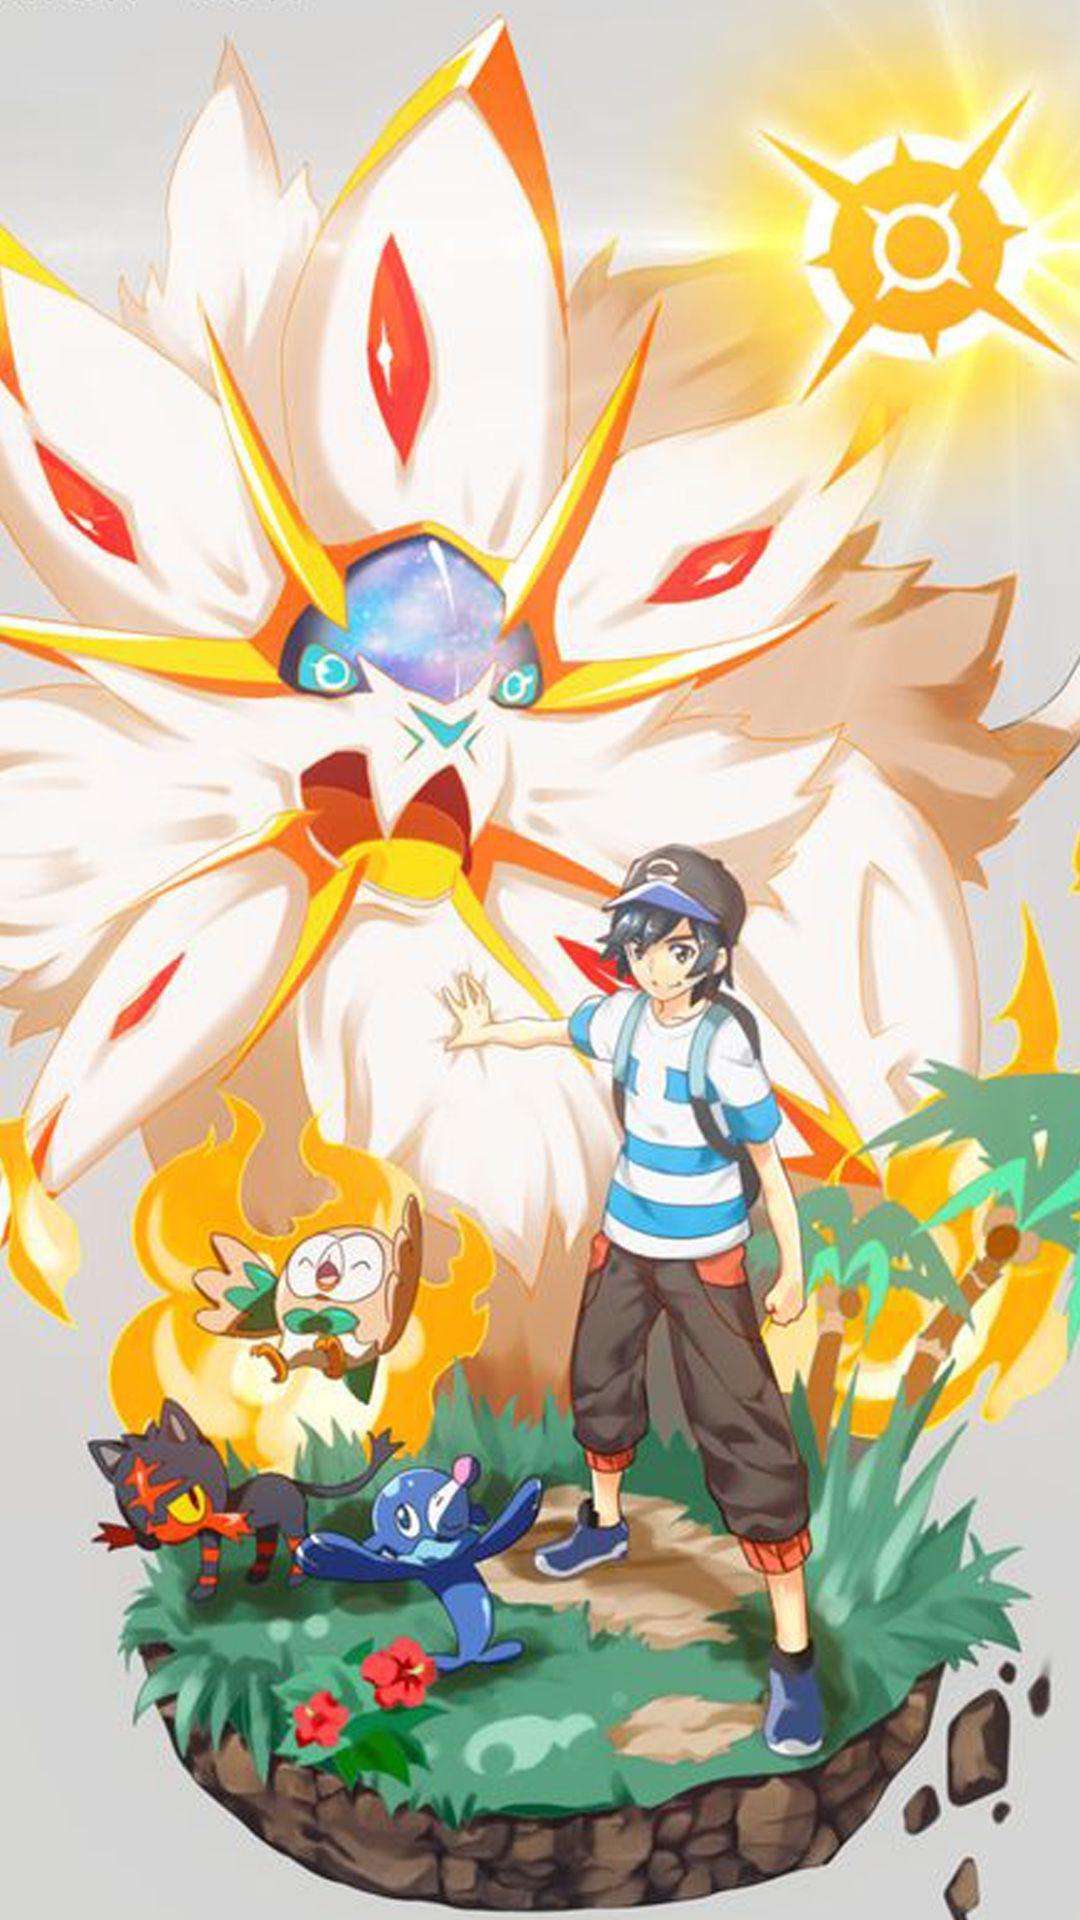 Pokémon Phone 4k Wallpapers - Wallpaper Cave